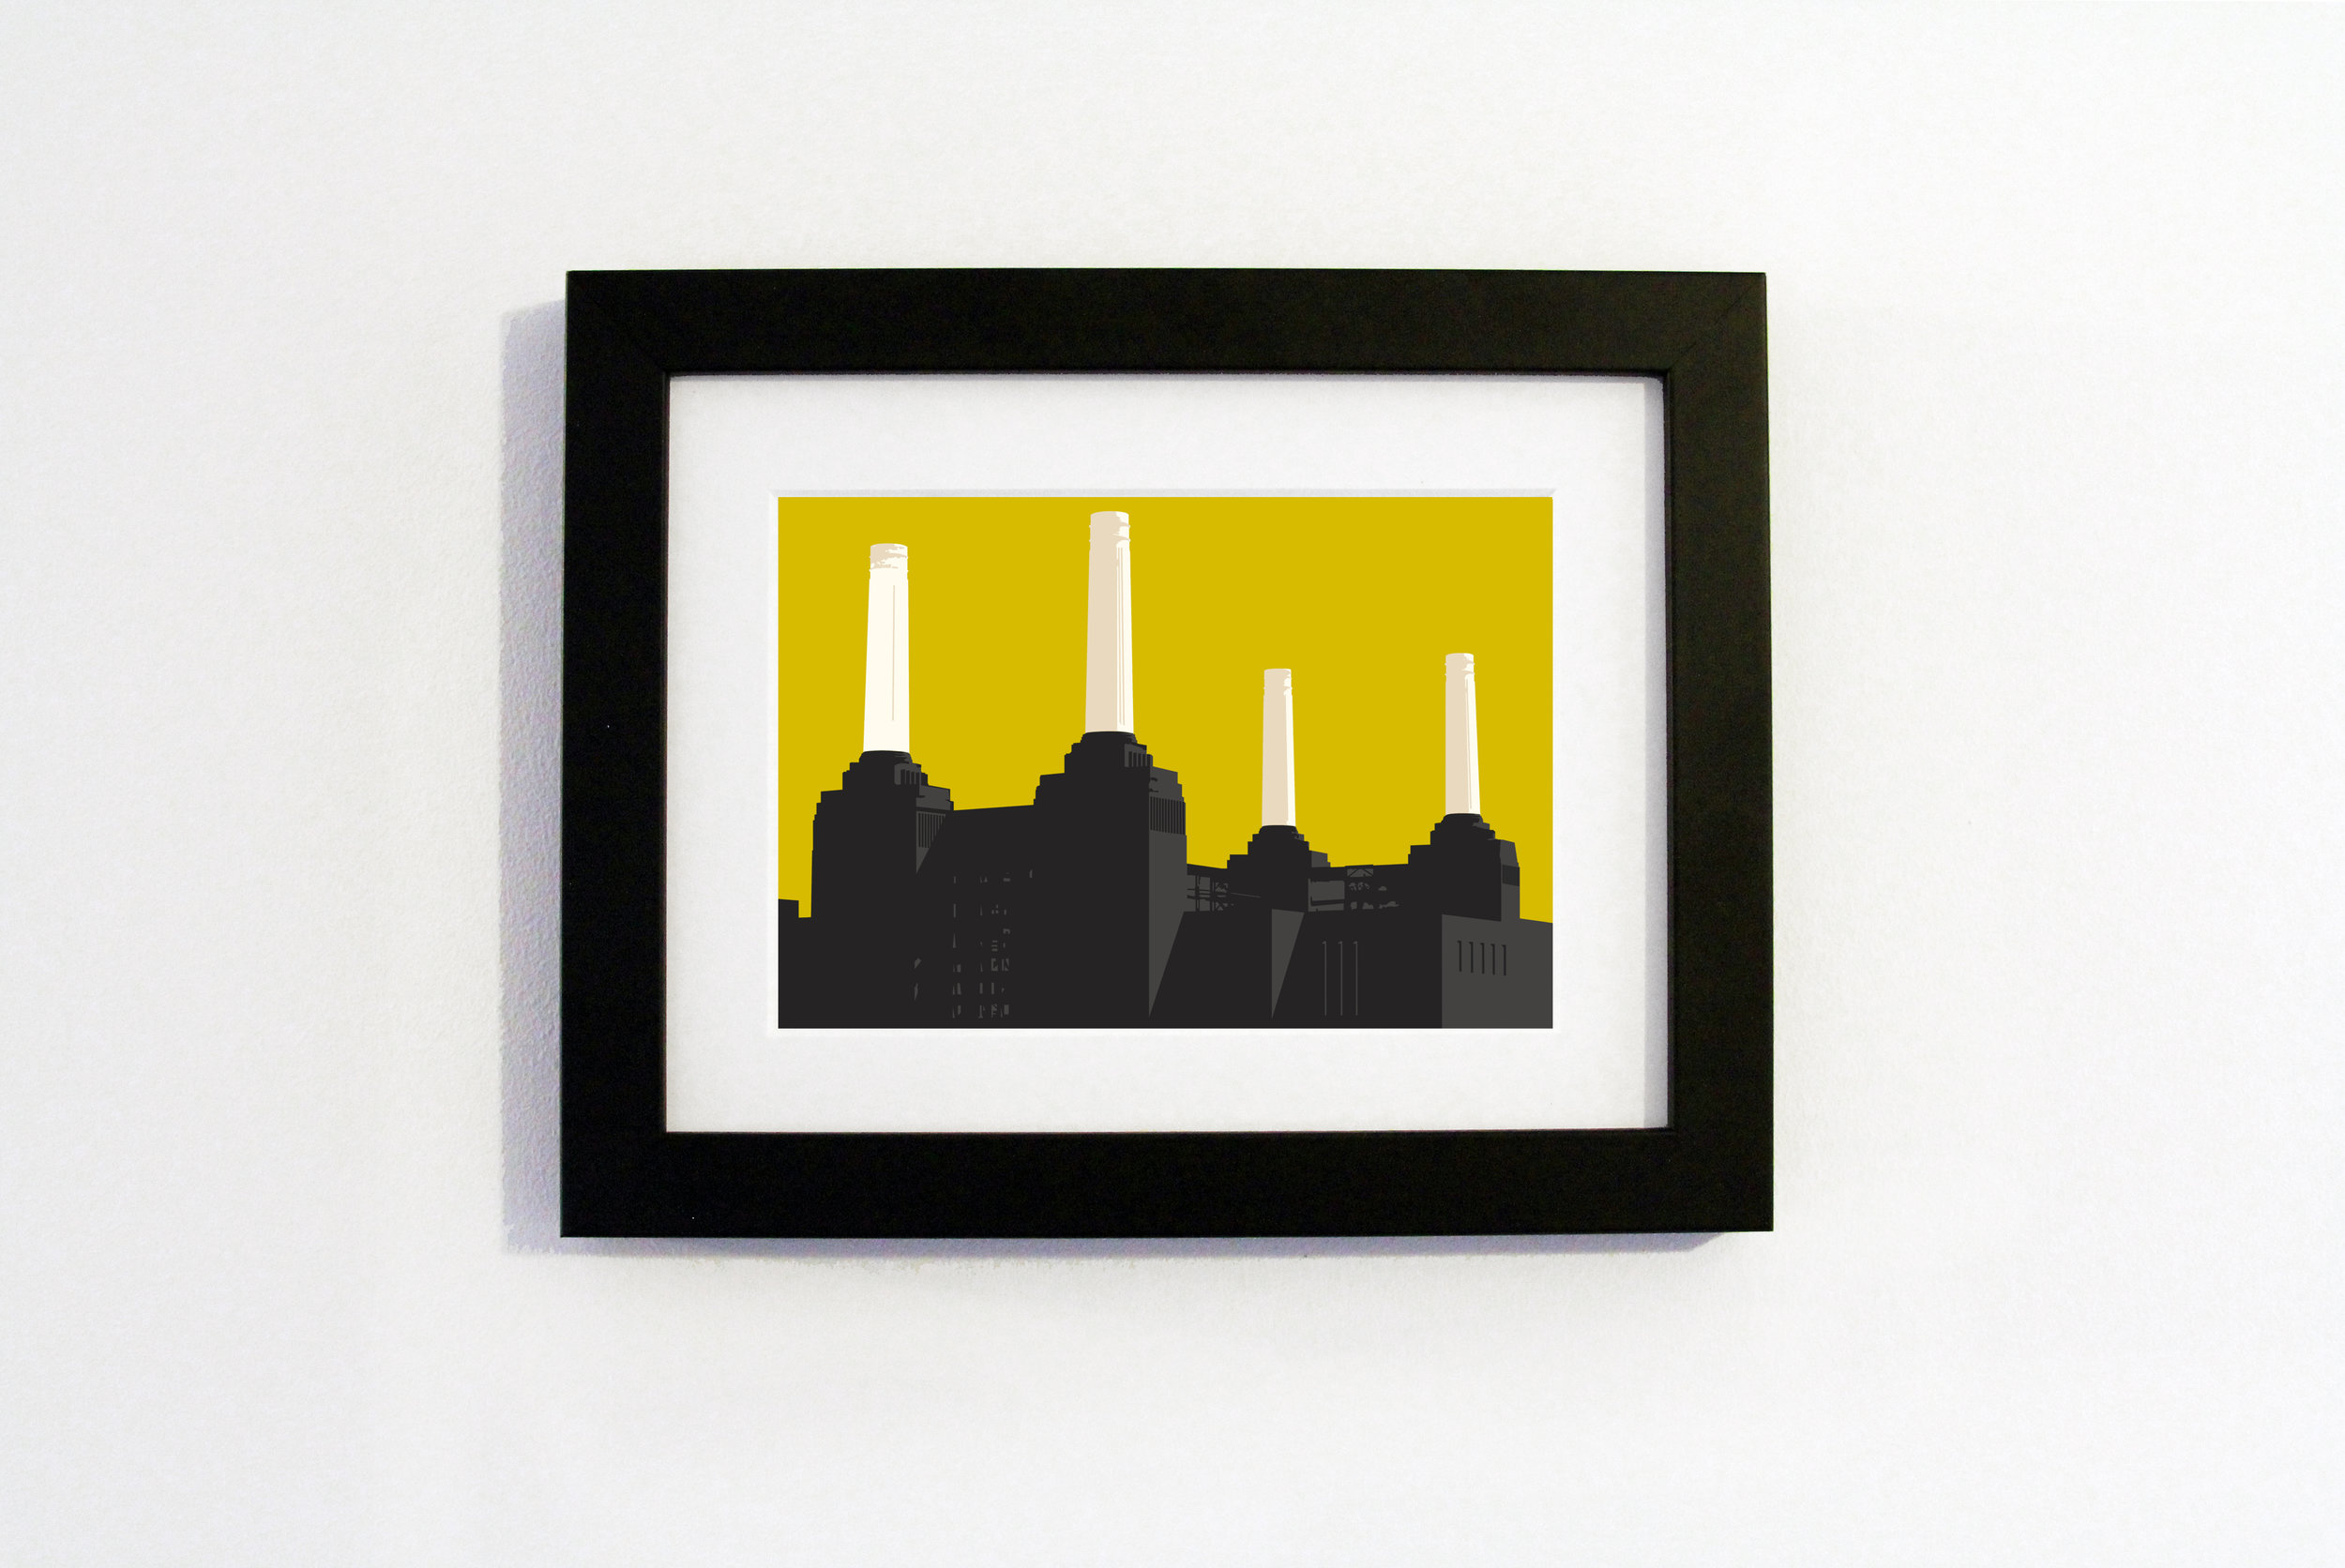 Battersea Yellow Black Frame.jpg